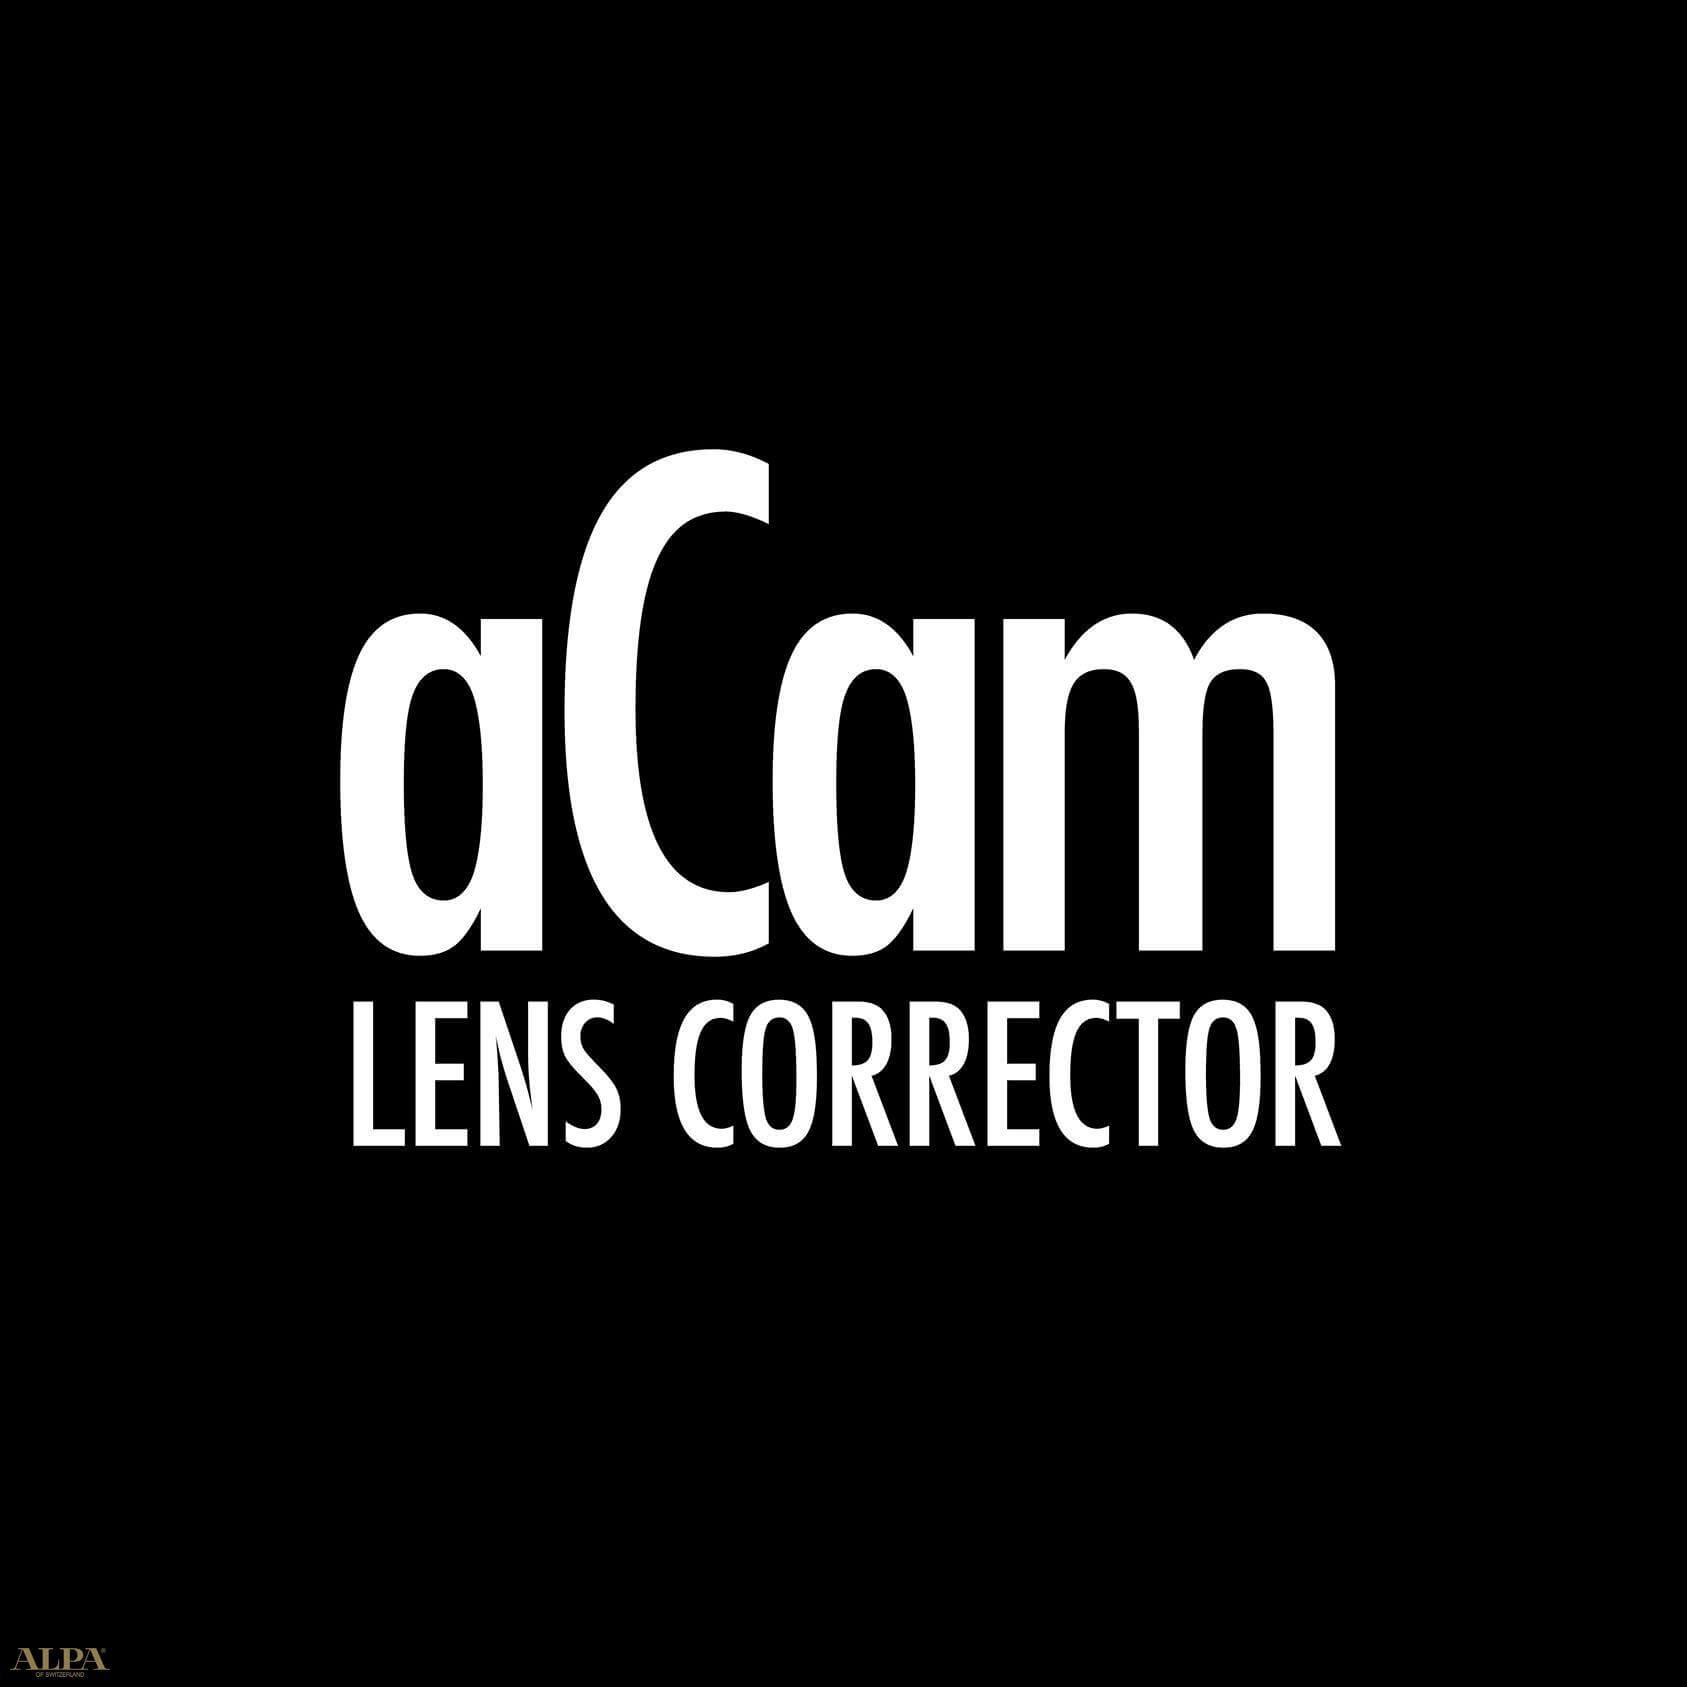 ALPA aCam Lens Corrector Plug-In